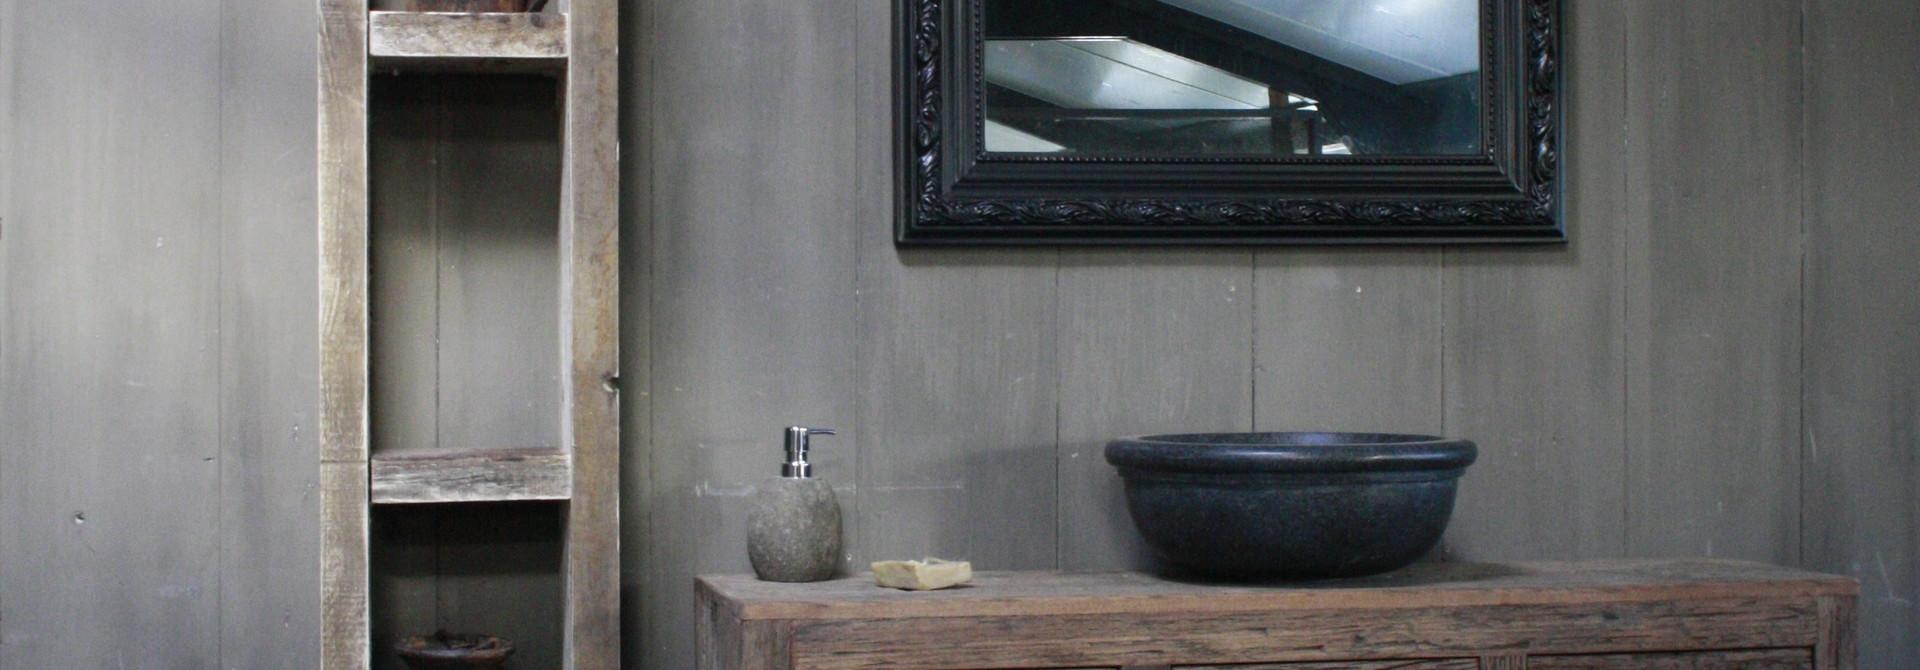 Kuifspiegel Barok Roma Black 117 x 80 cm